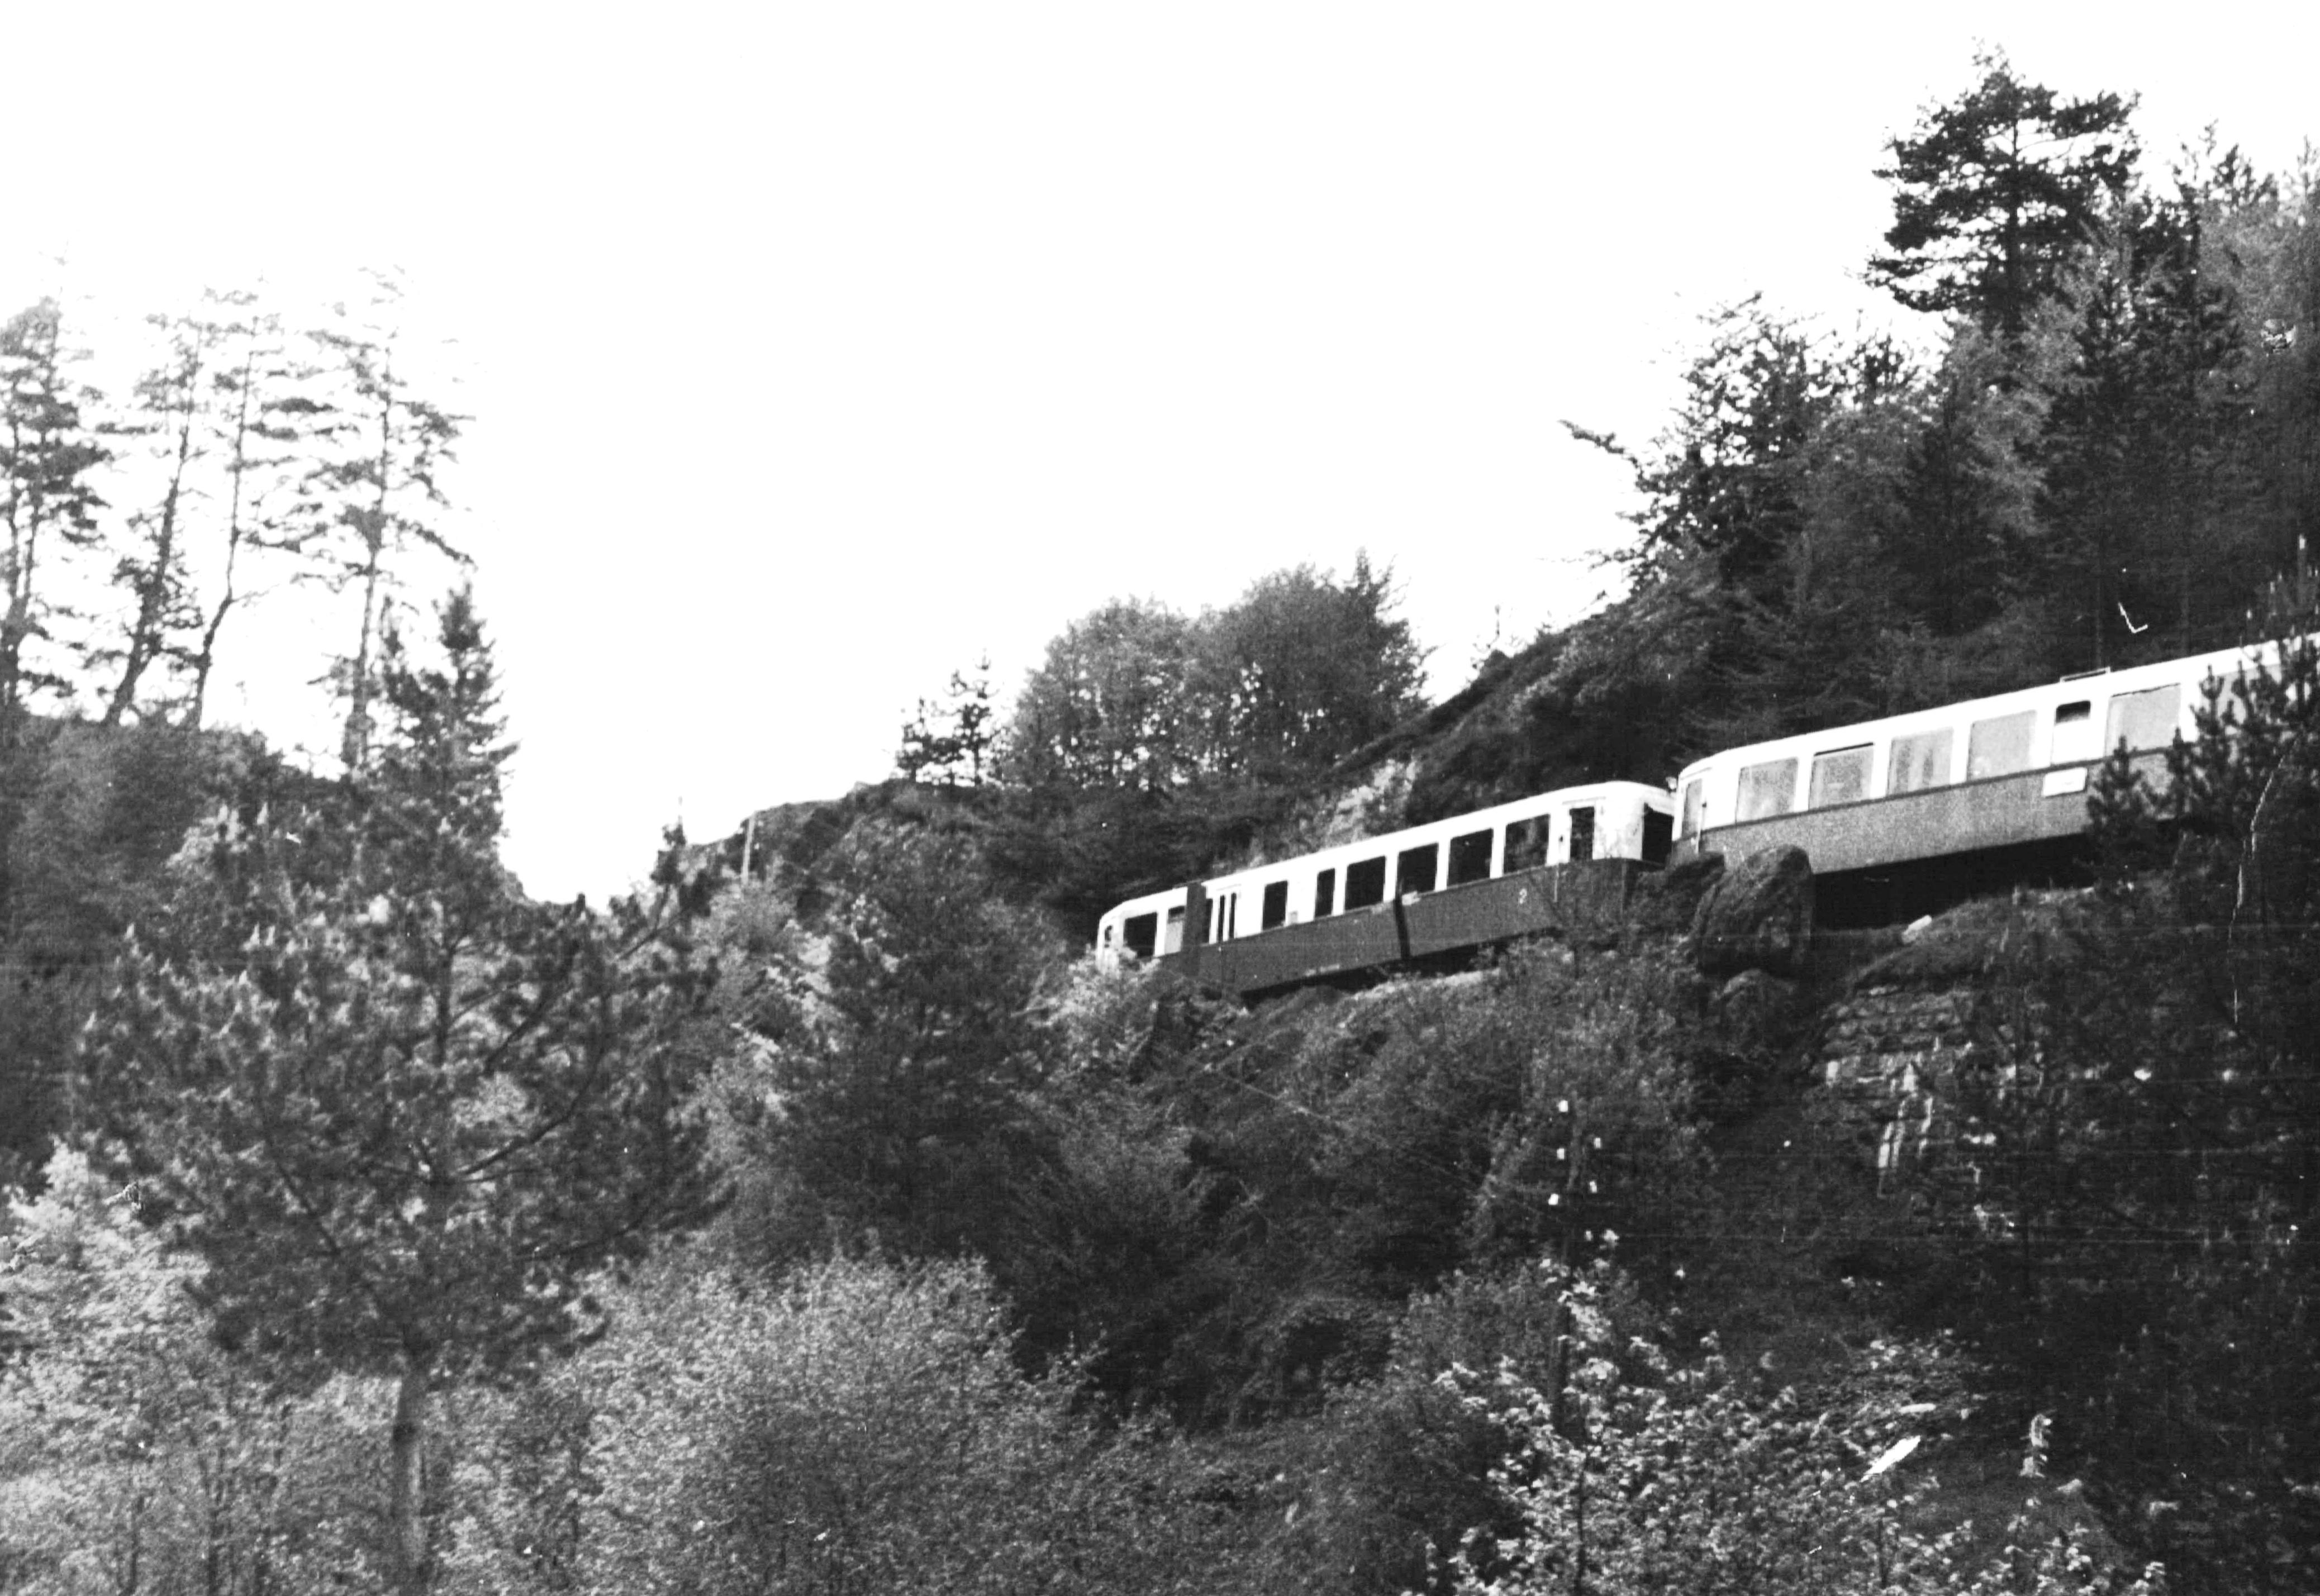 Мотрисен влак, 50-те години